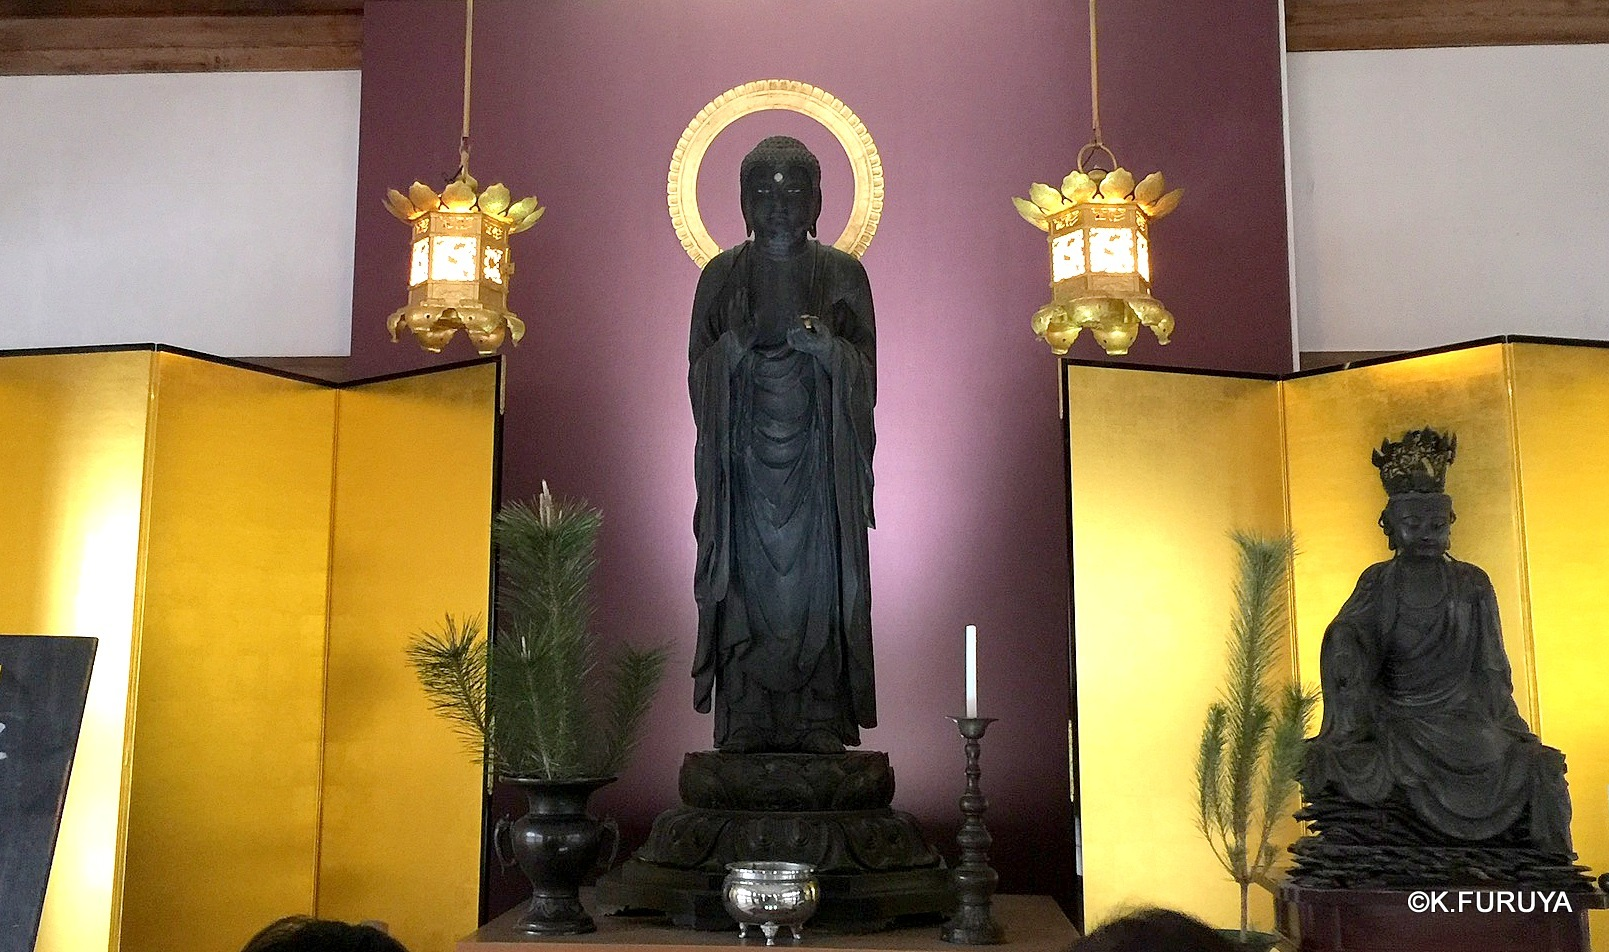 ☂ 雨の鎌倉散策 ☂ 円覚寺 其の弐_a0092659_15152468.jpg